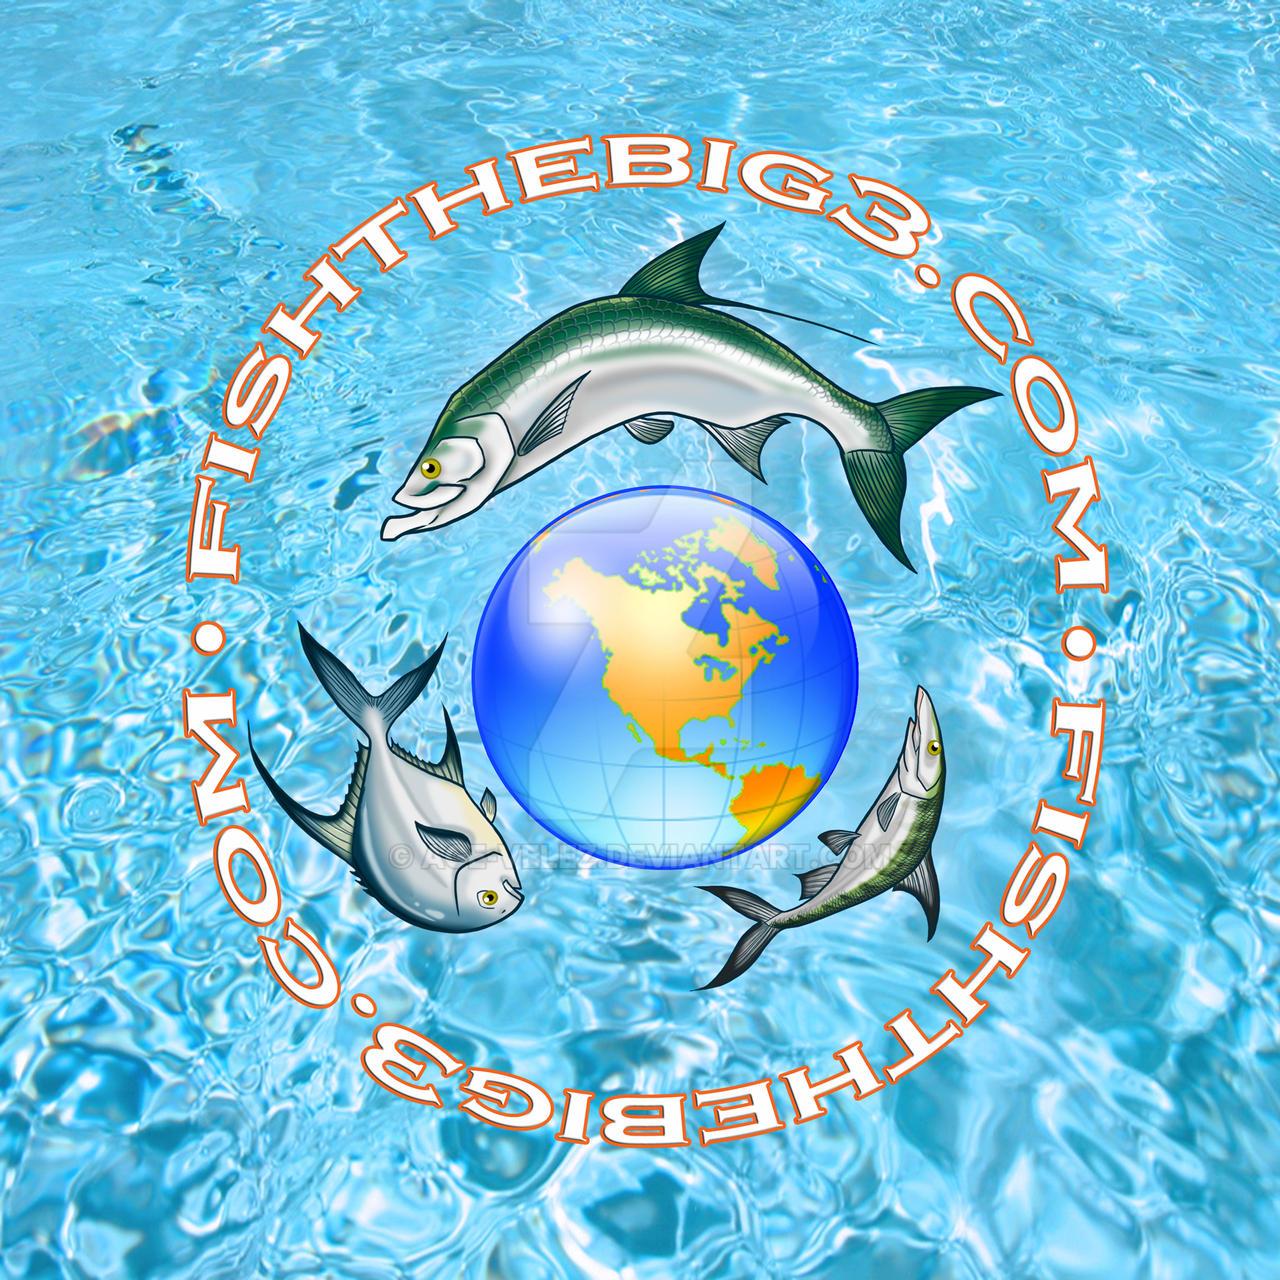 Fish the big 3 logo by Age-Velez